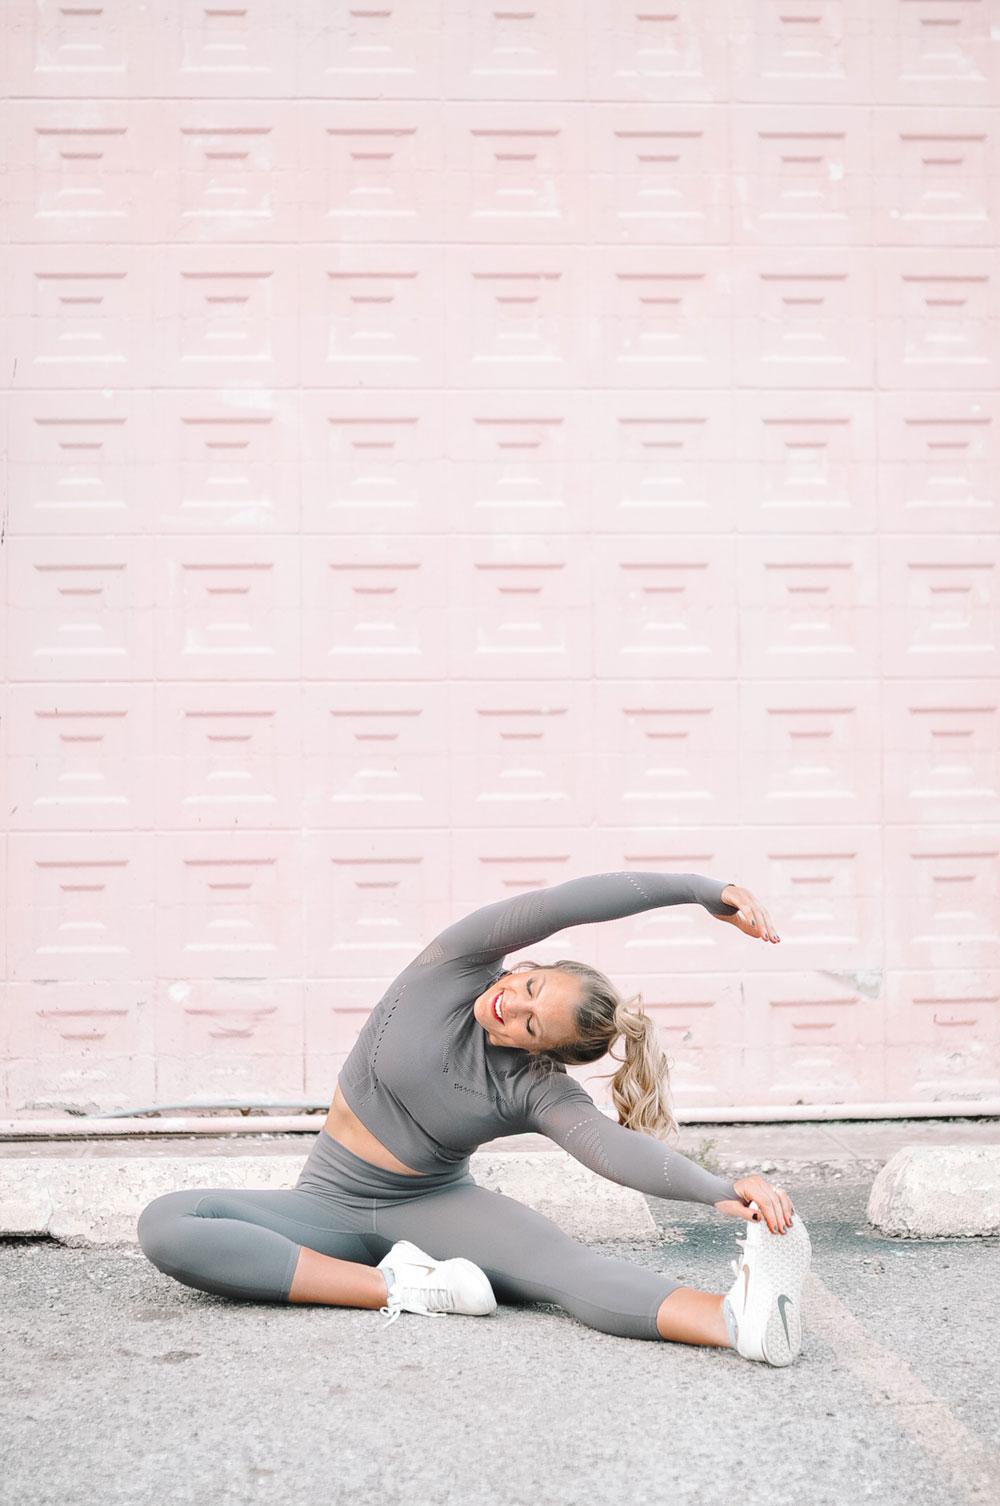 Amanda Martin of Amanda's OK Blog shares tips for finding work life balance in blogging